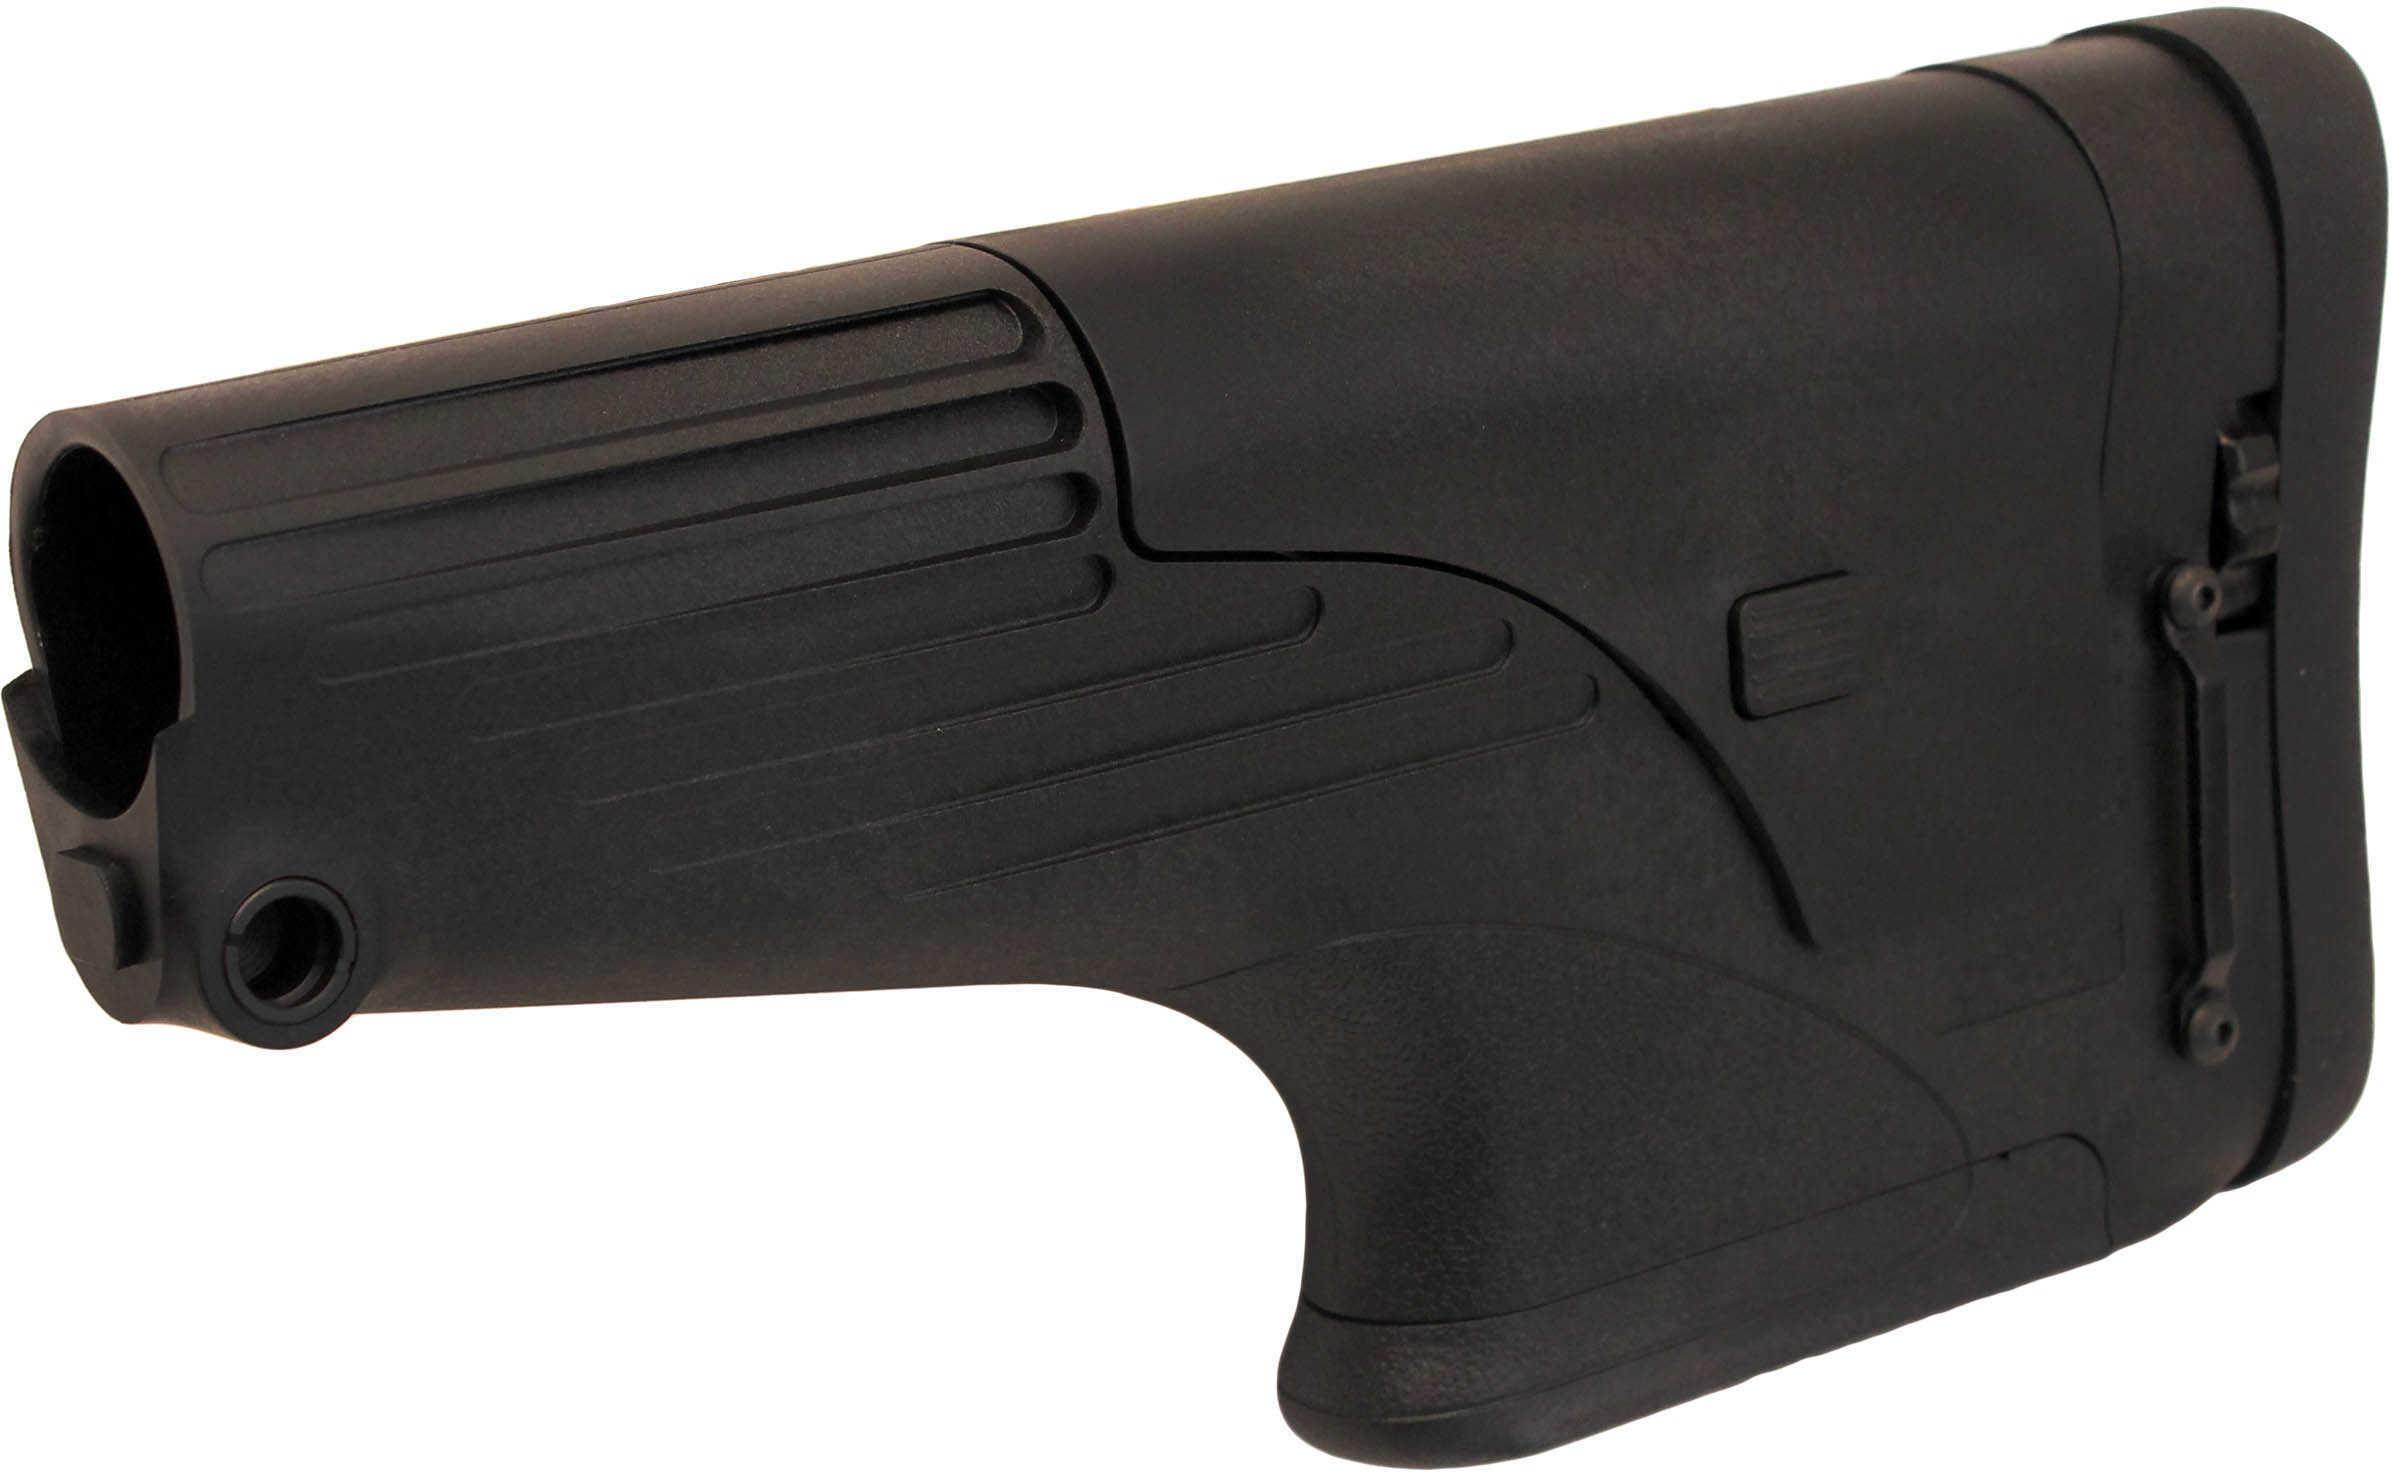 TacStar Adjustable Match Stock, Fits AR Rifles, Black Finish 1081123